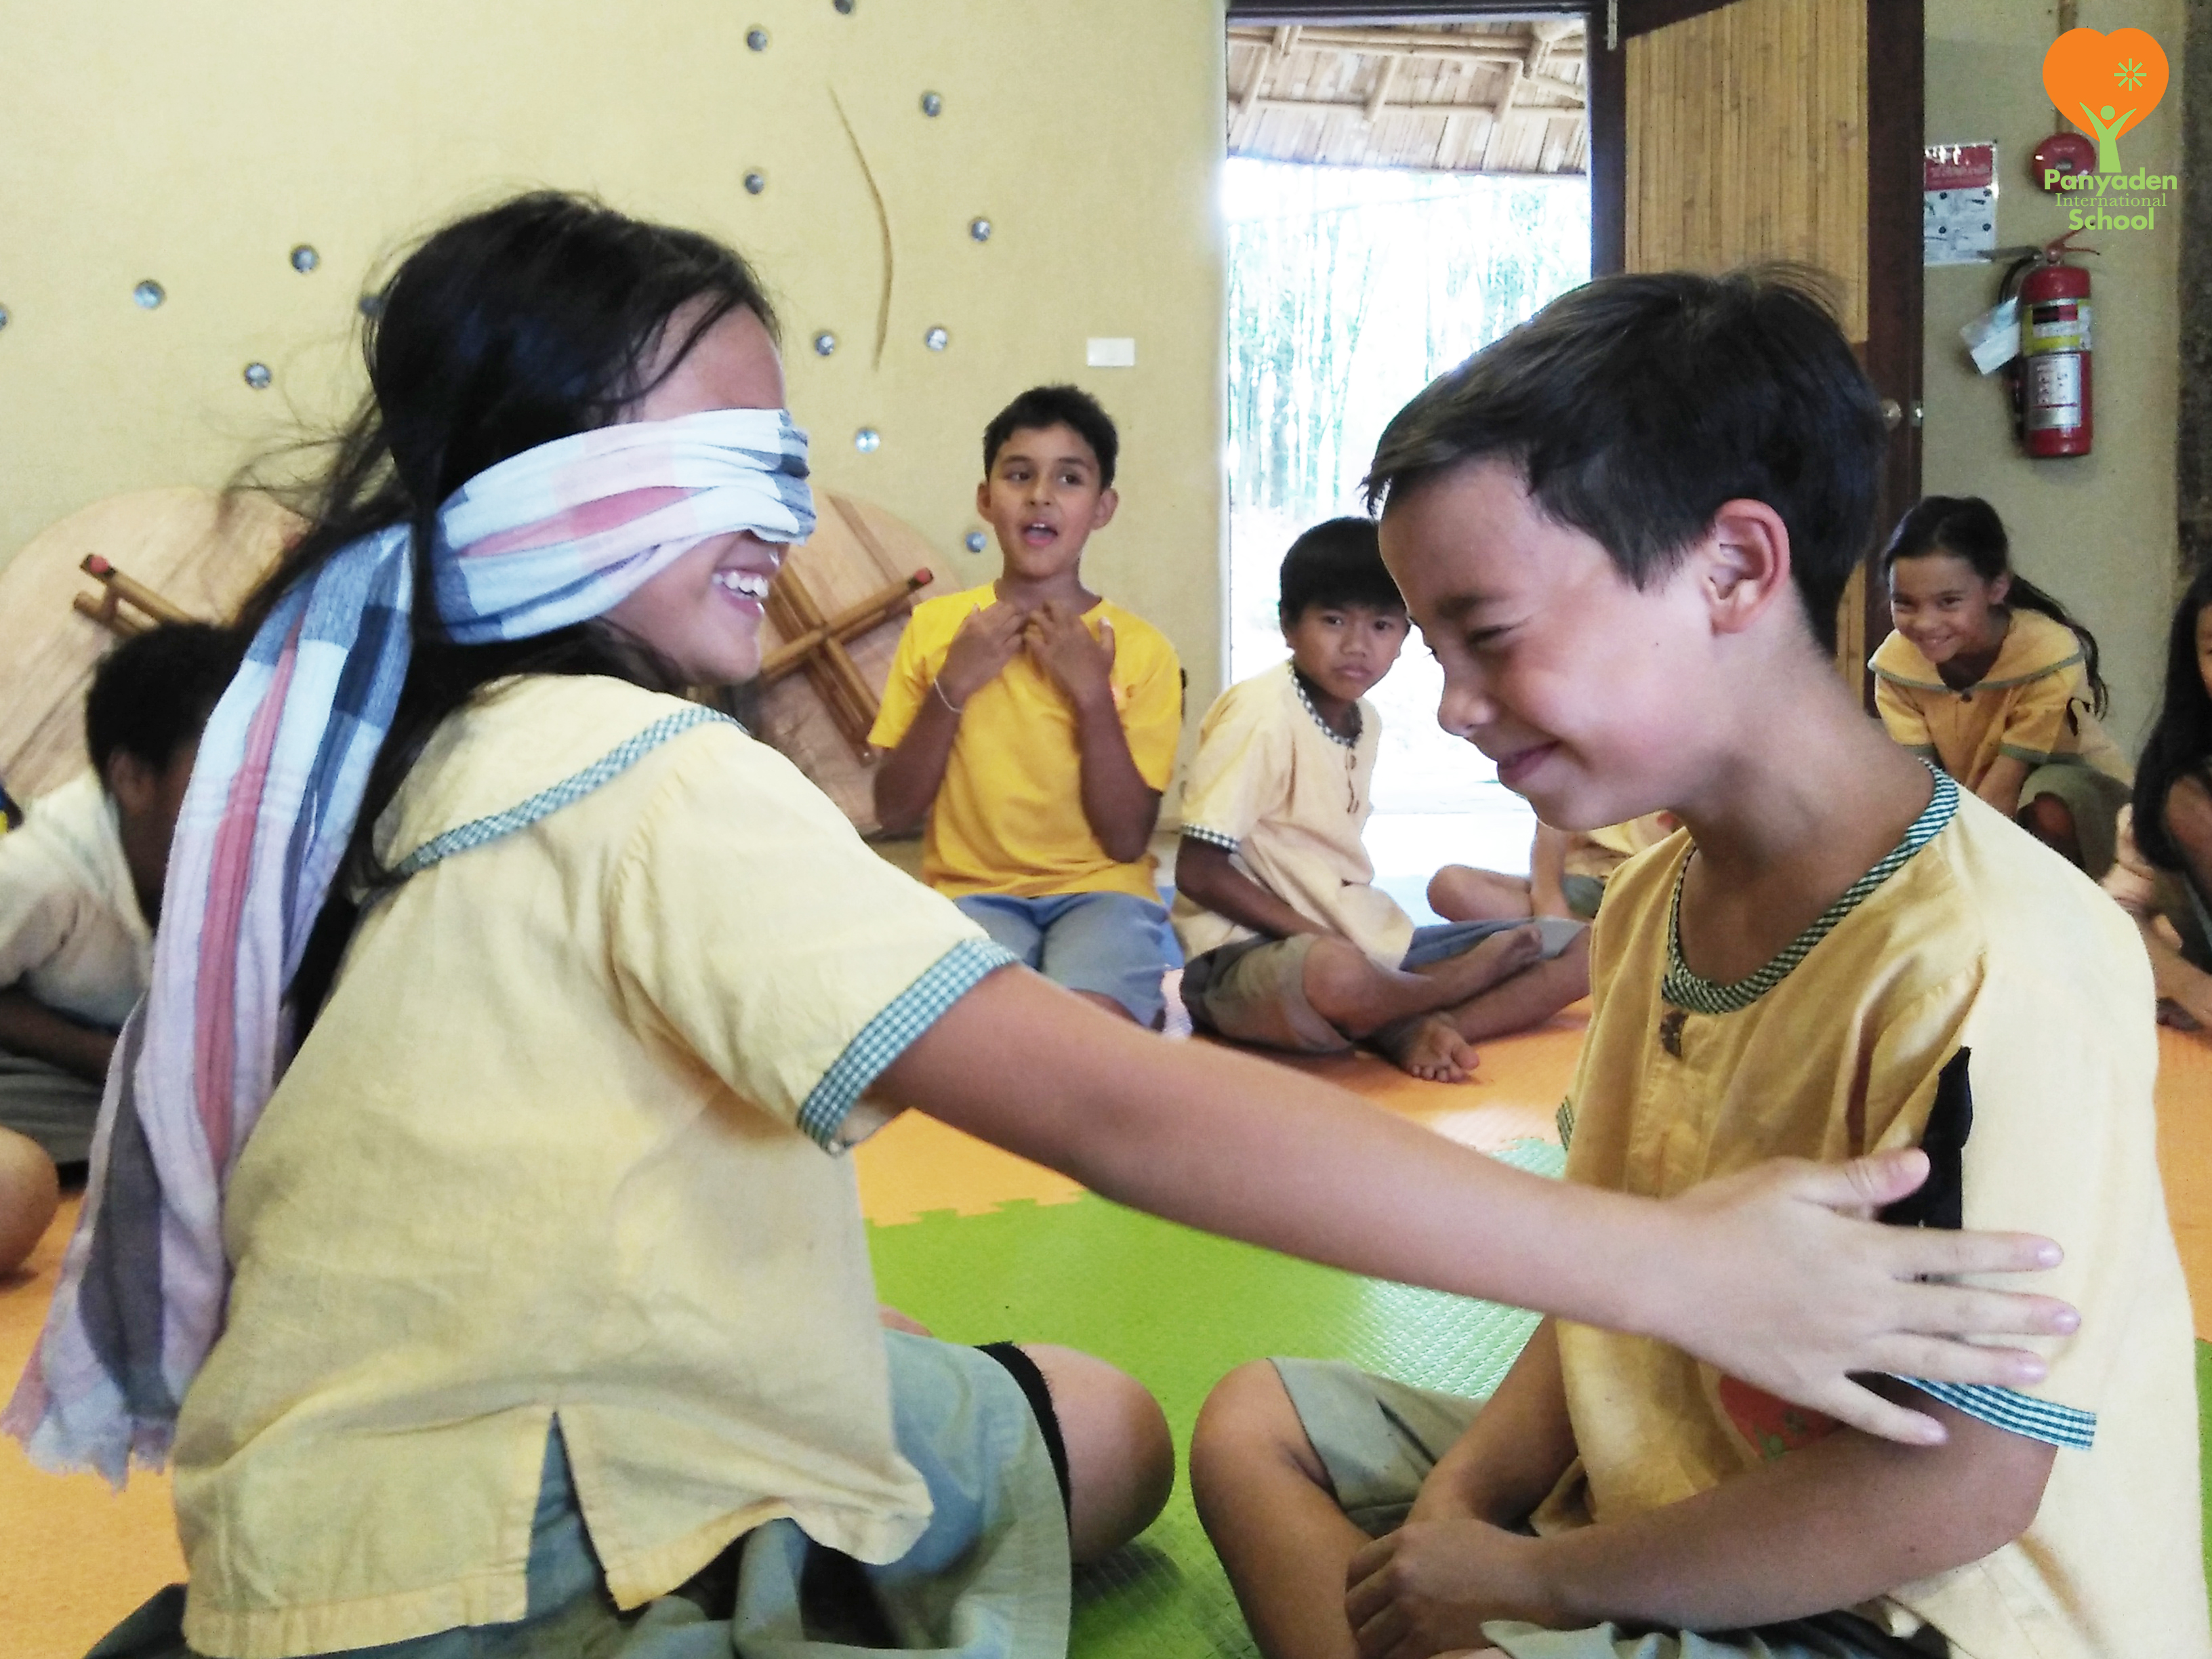 Panyaden Year 4 performing arts class - building empthay